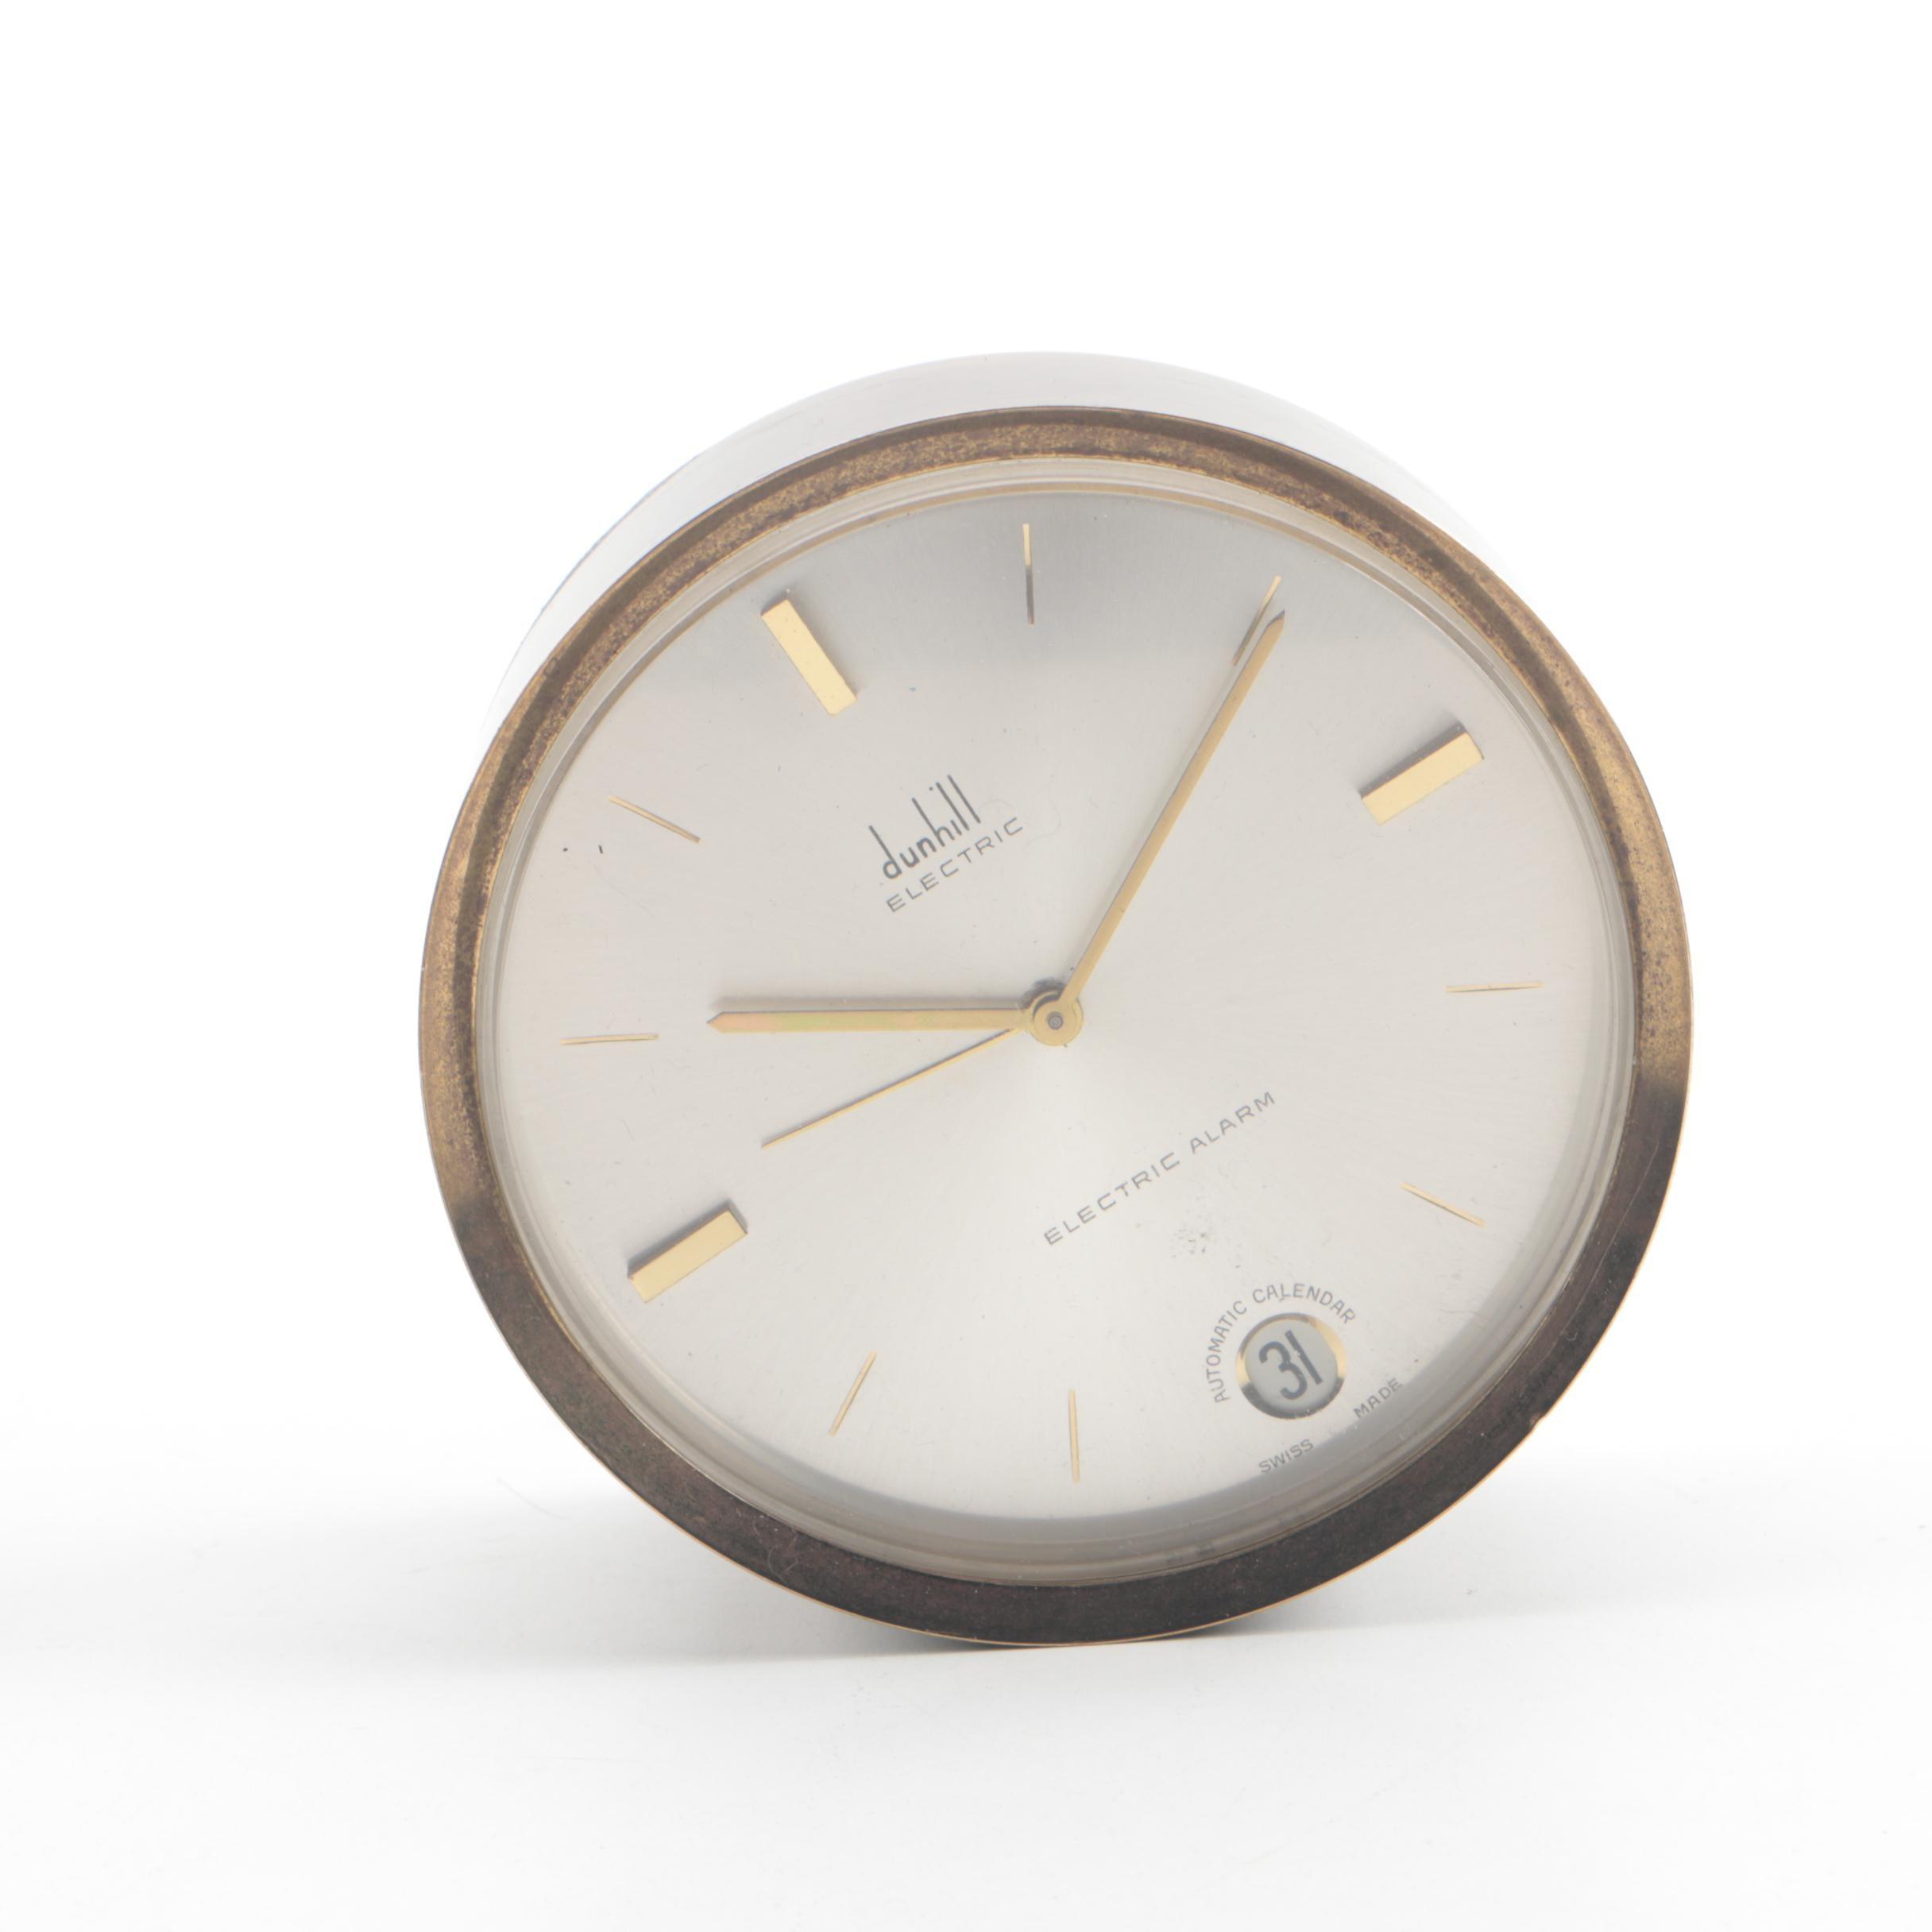 Circa 1950s Alfred Dunhill Brass Travel Alarm Clock